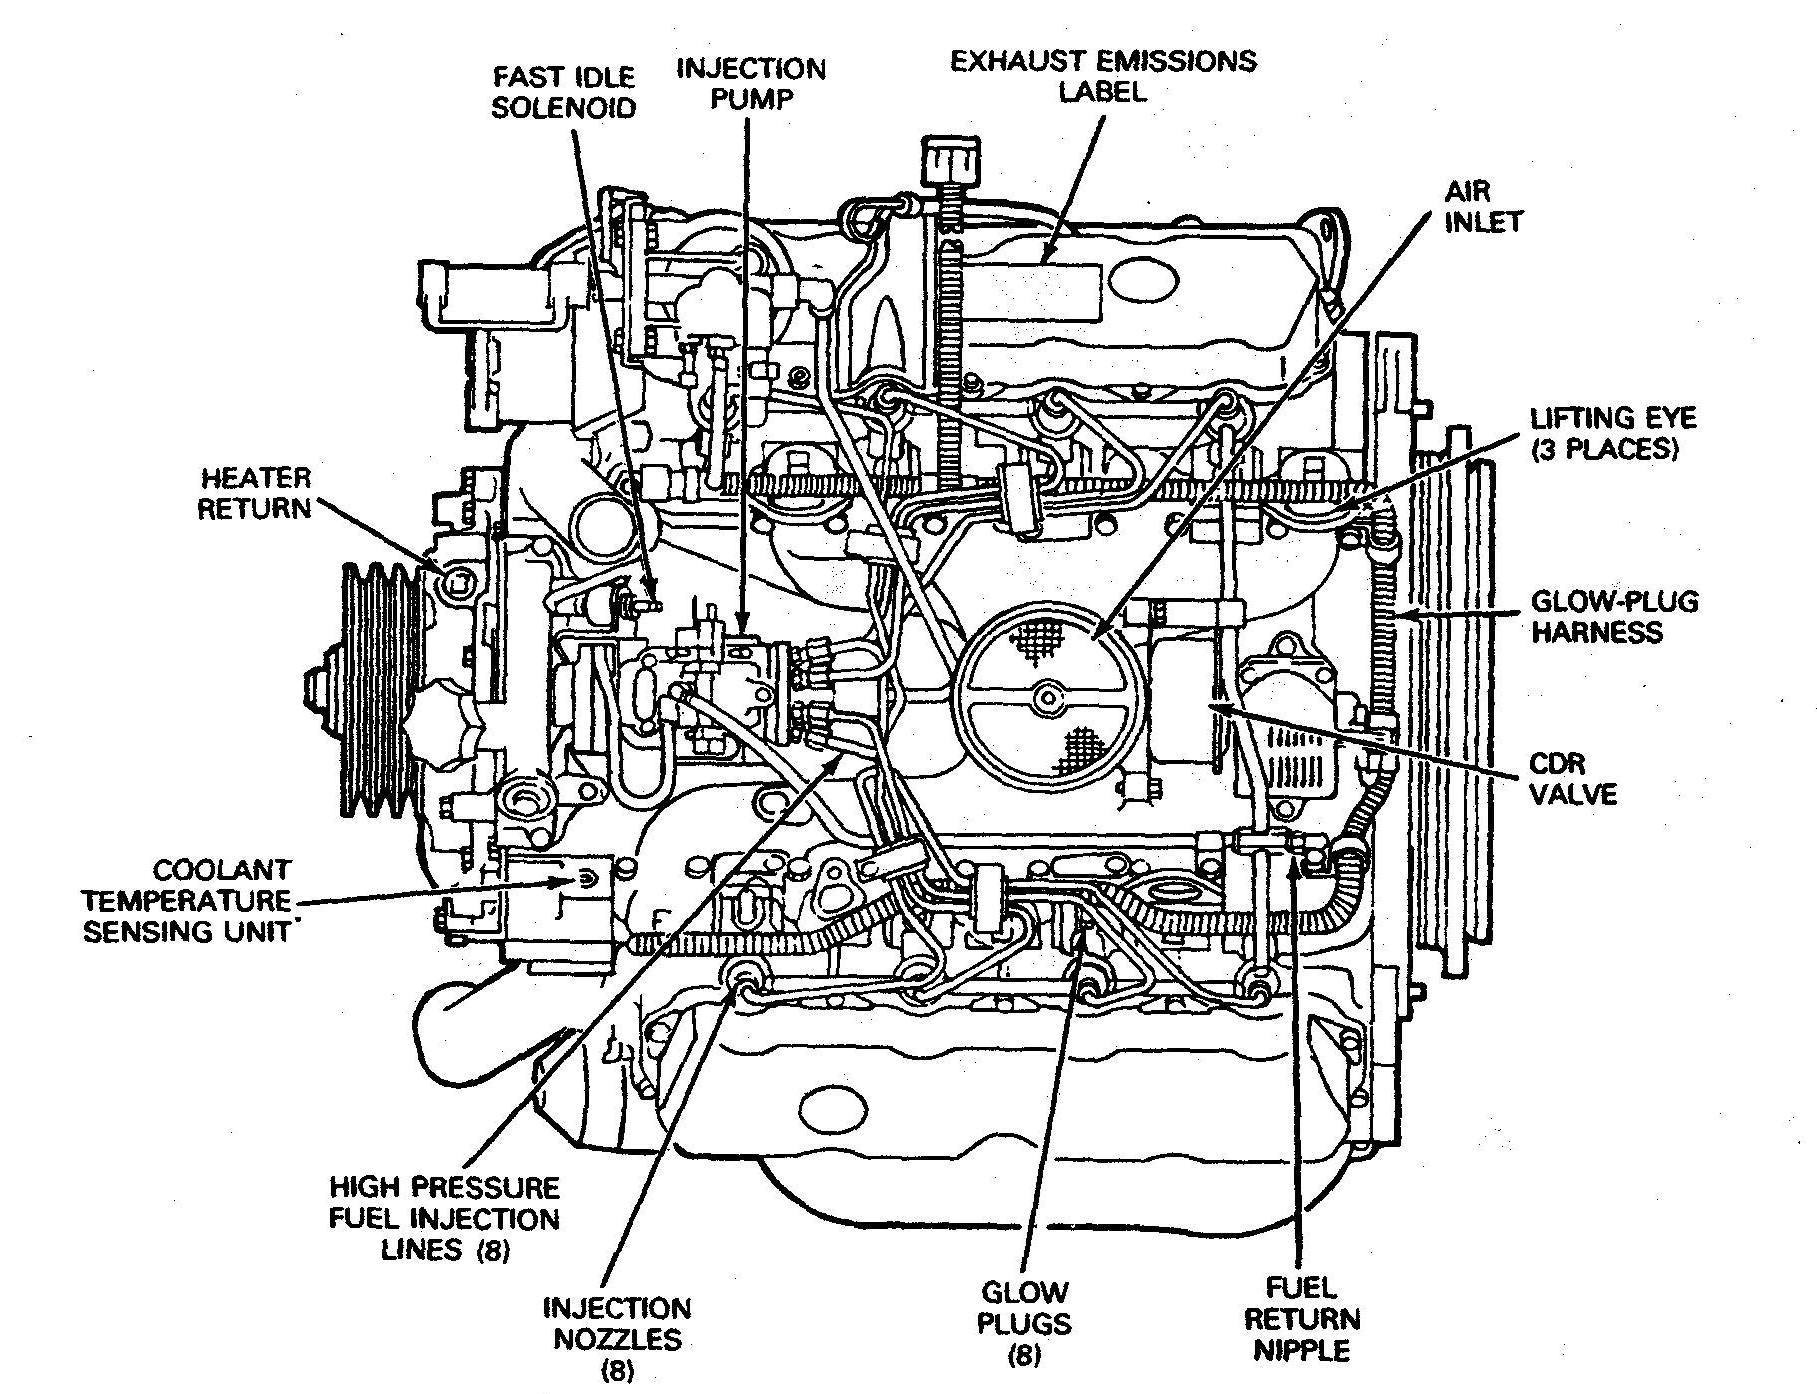 Chevy V8 Engine Diagram - 1994 Jeep Cherokee Wiring Diagram Radio -  power-poles.yenpancane.jeanjaures37.fr | Chevy 350 Engine Schematic |  | Wiring Diagram Resource